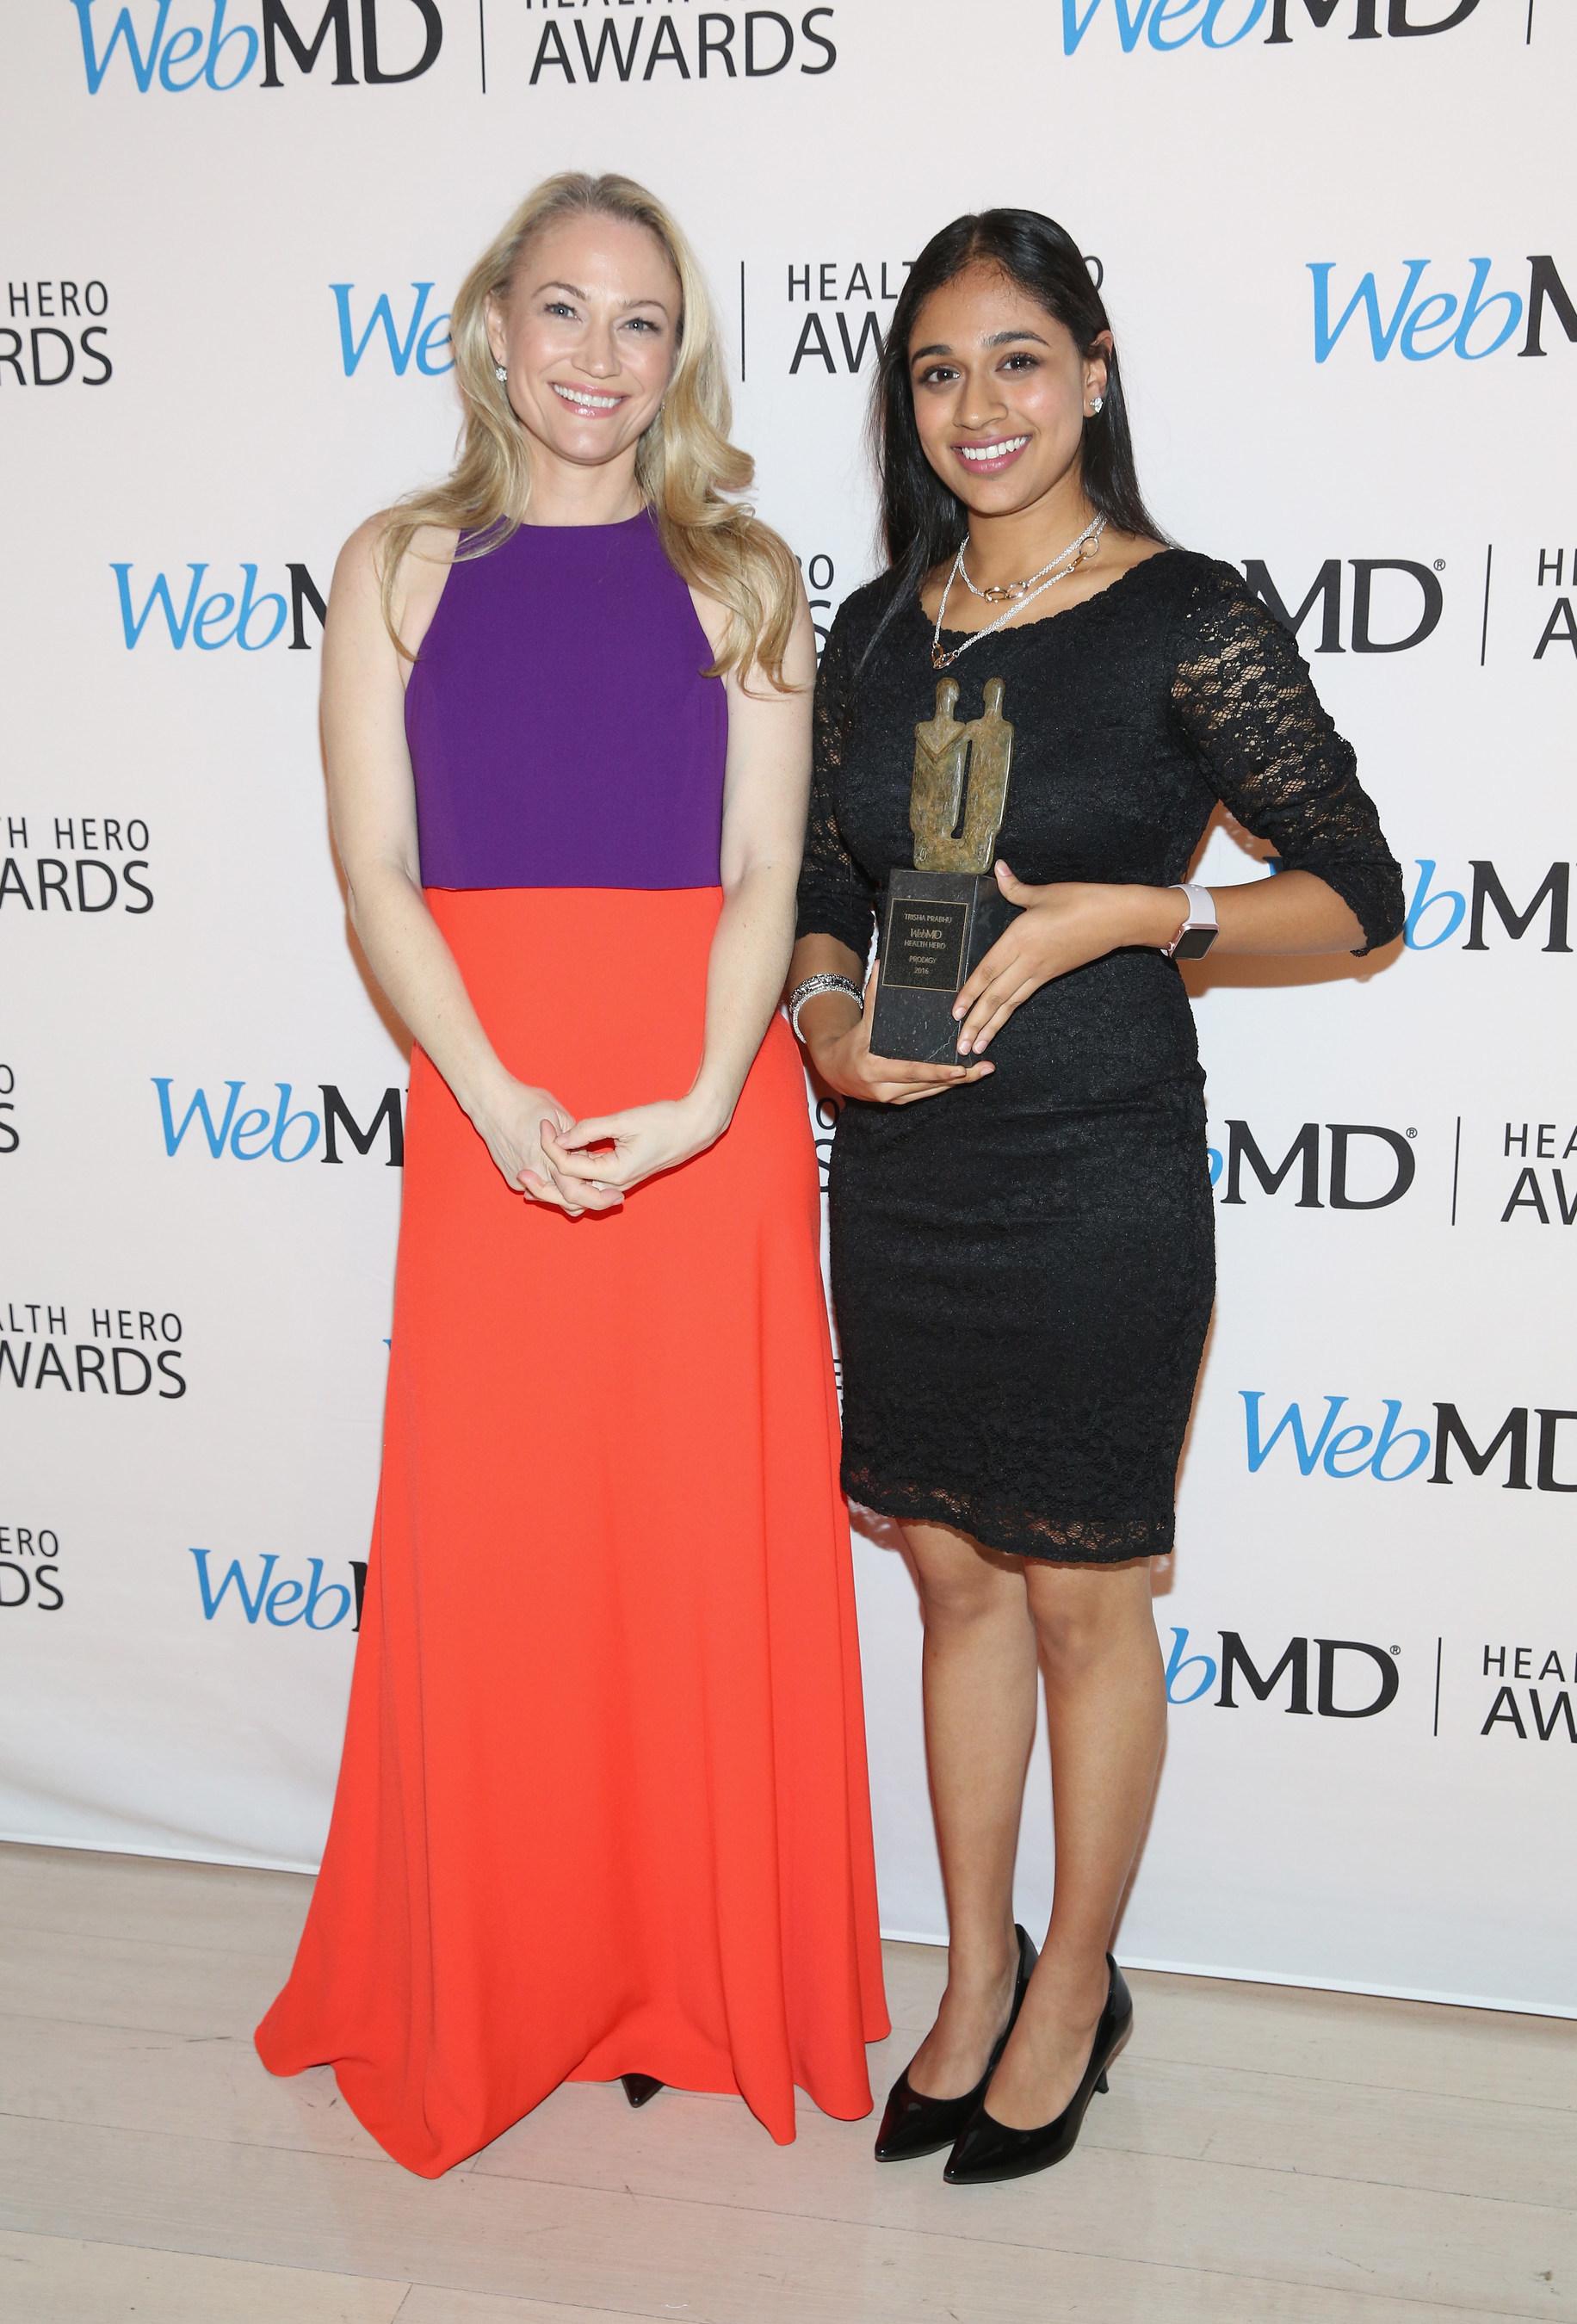 Sarah Wynter and WebMD Health Hero Prodigy Award recipient Trisha Prabhu attend the 2016 WebMD Health Heroes Awards on November 3, 2016 in New York City.